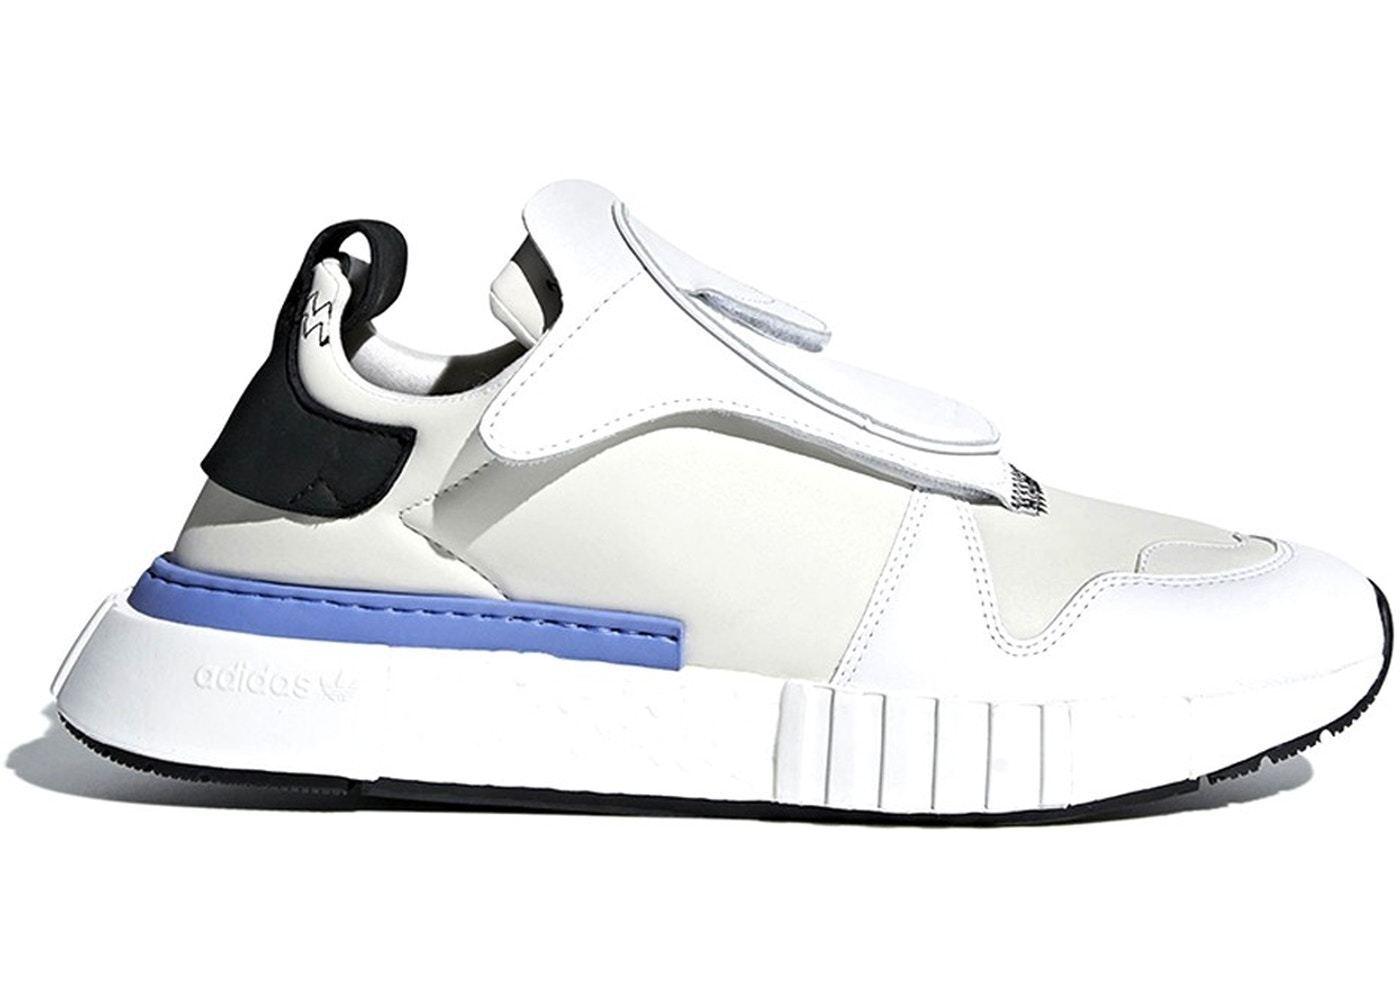 Adidas grau Futurepacer Turnschuhe US 12  180